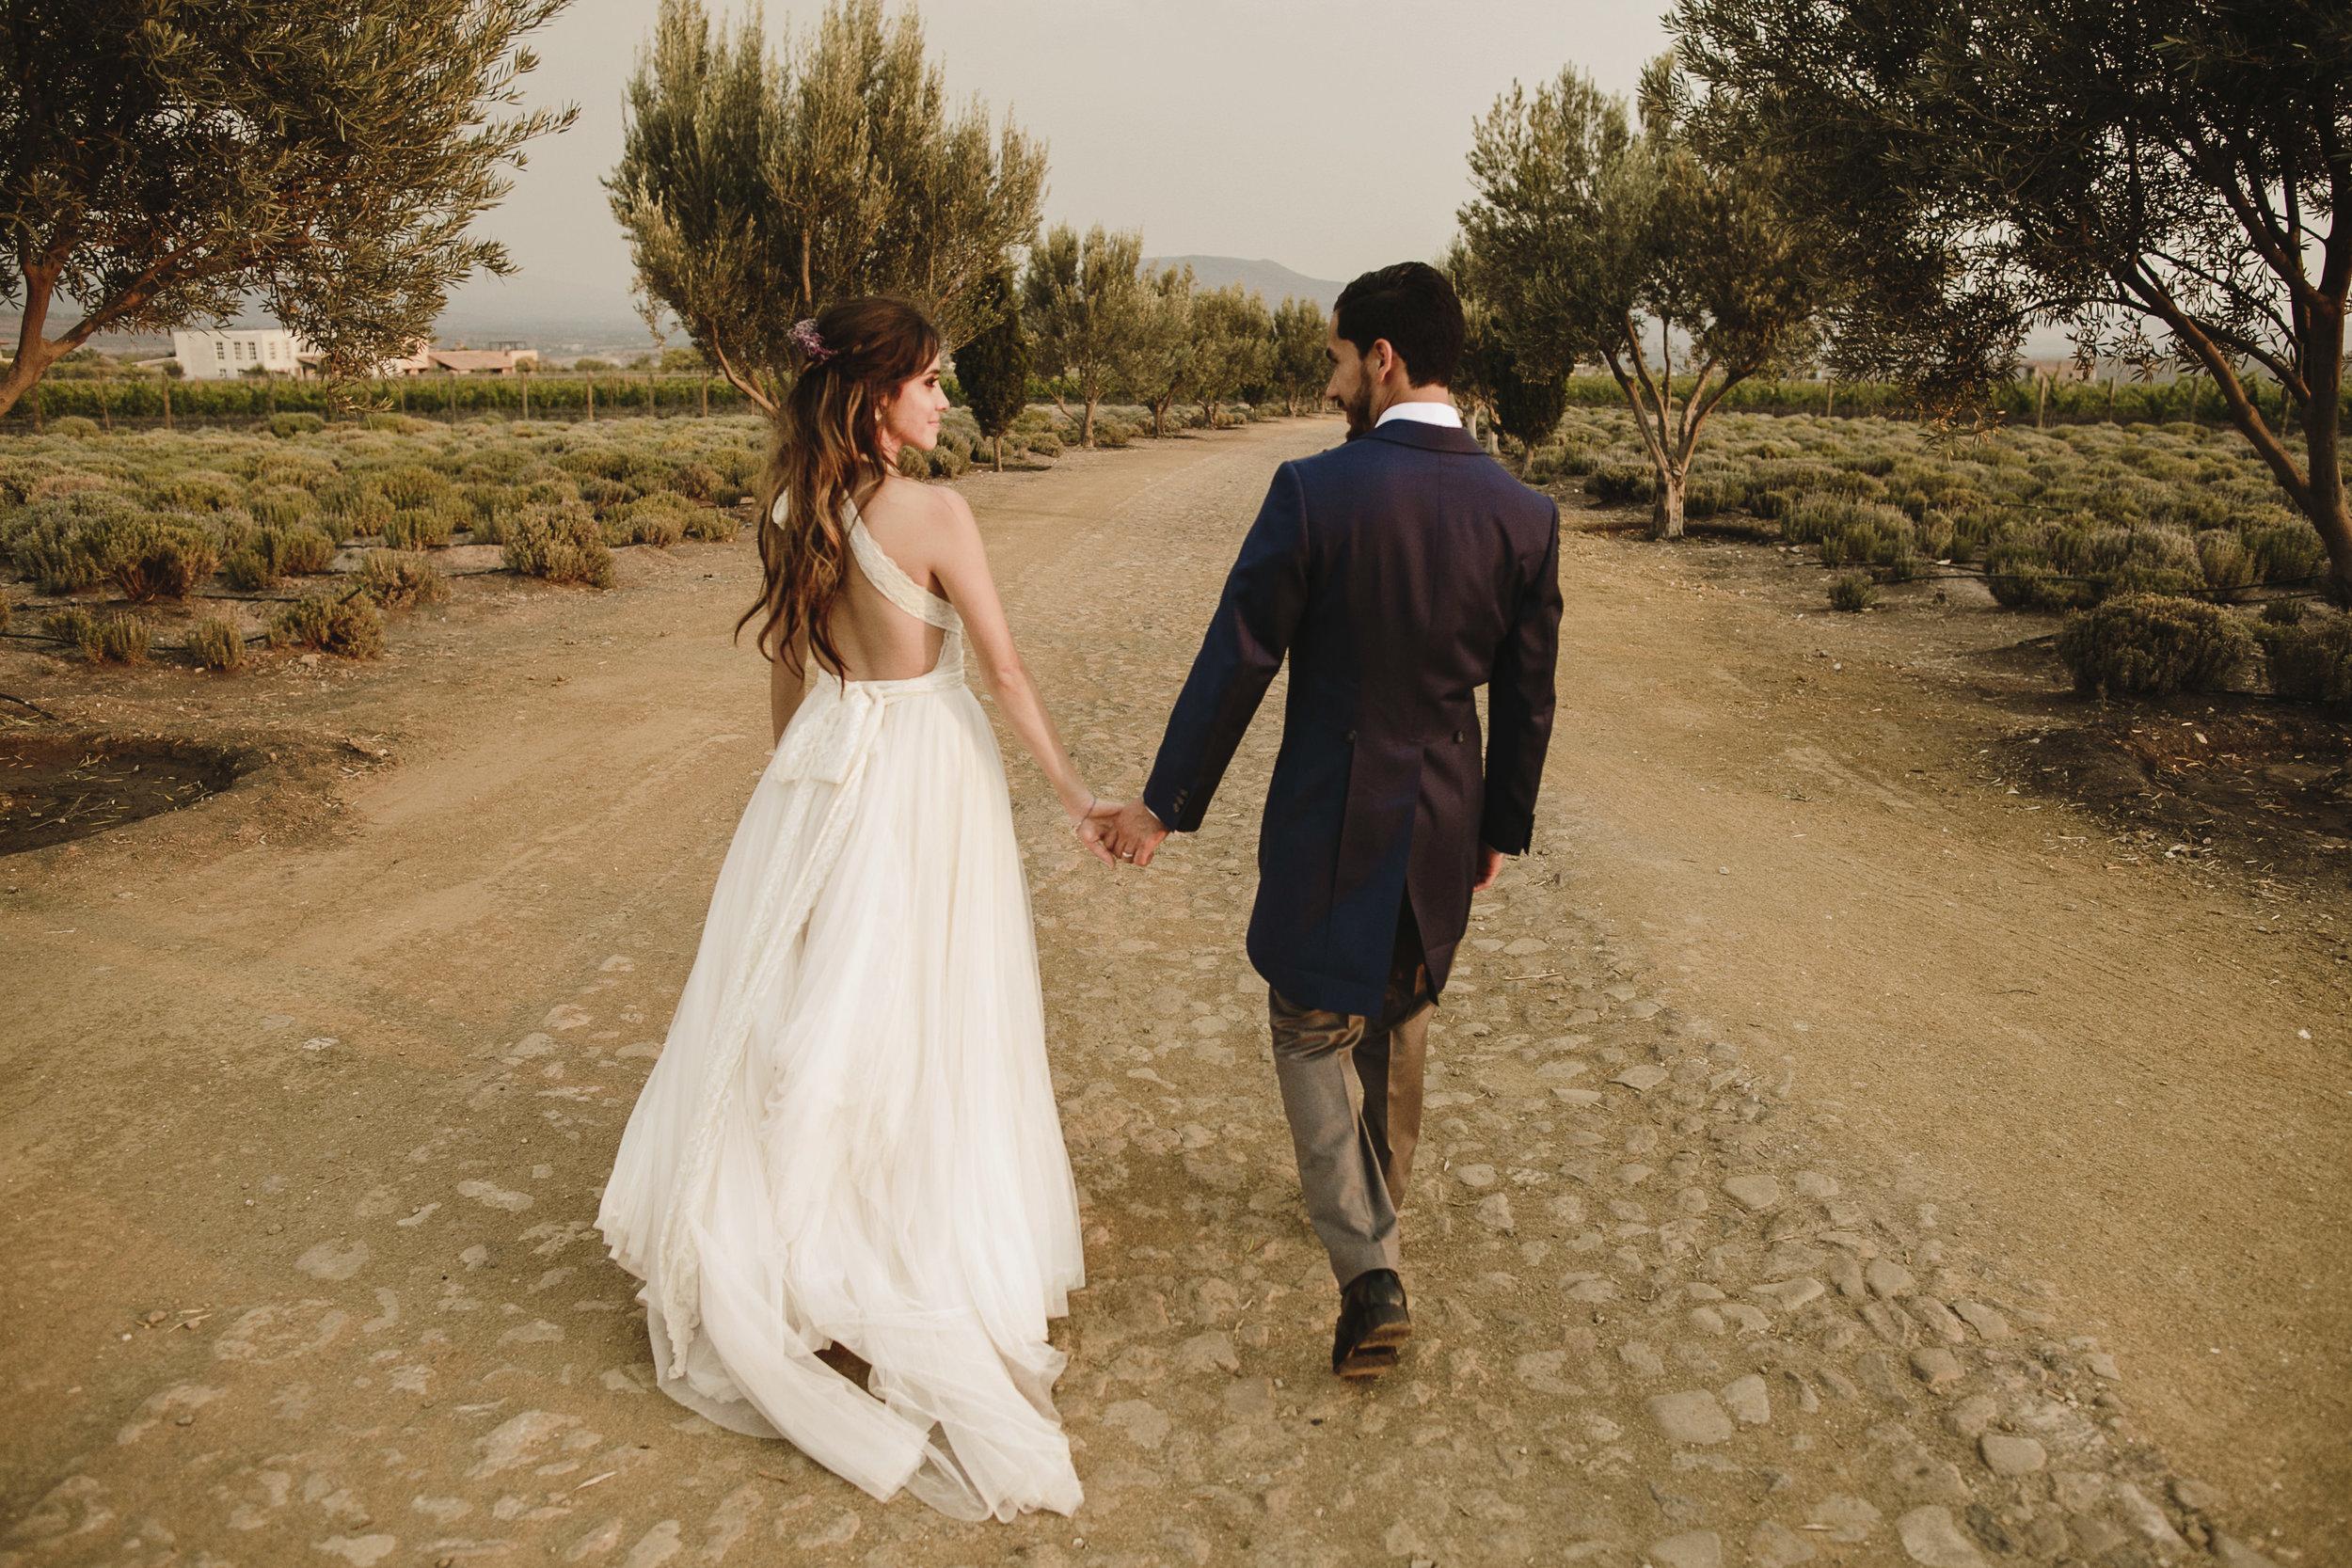 alfons_flores_destination_wedding_photography_mavi_david-1846.JPG